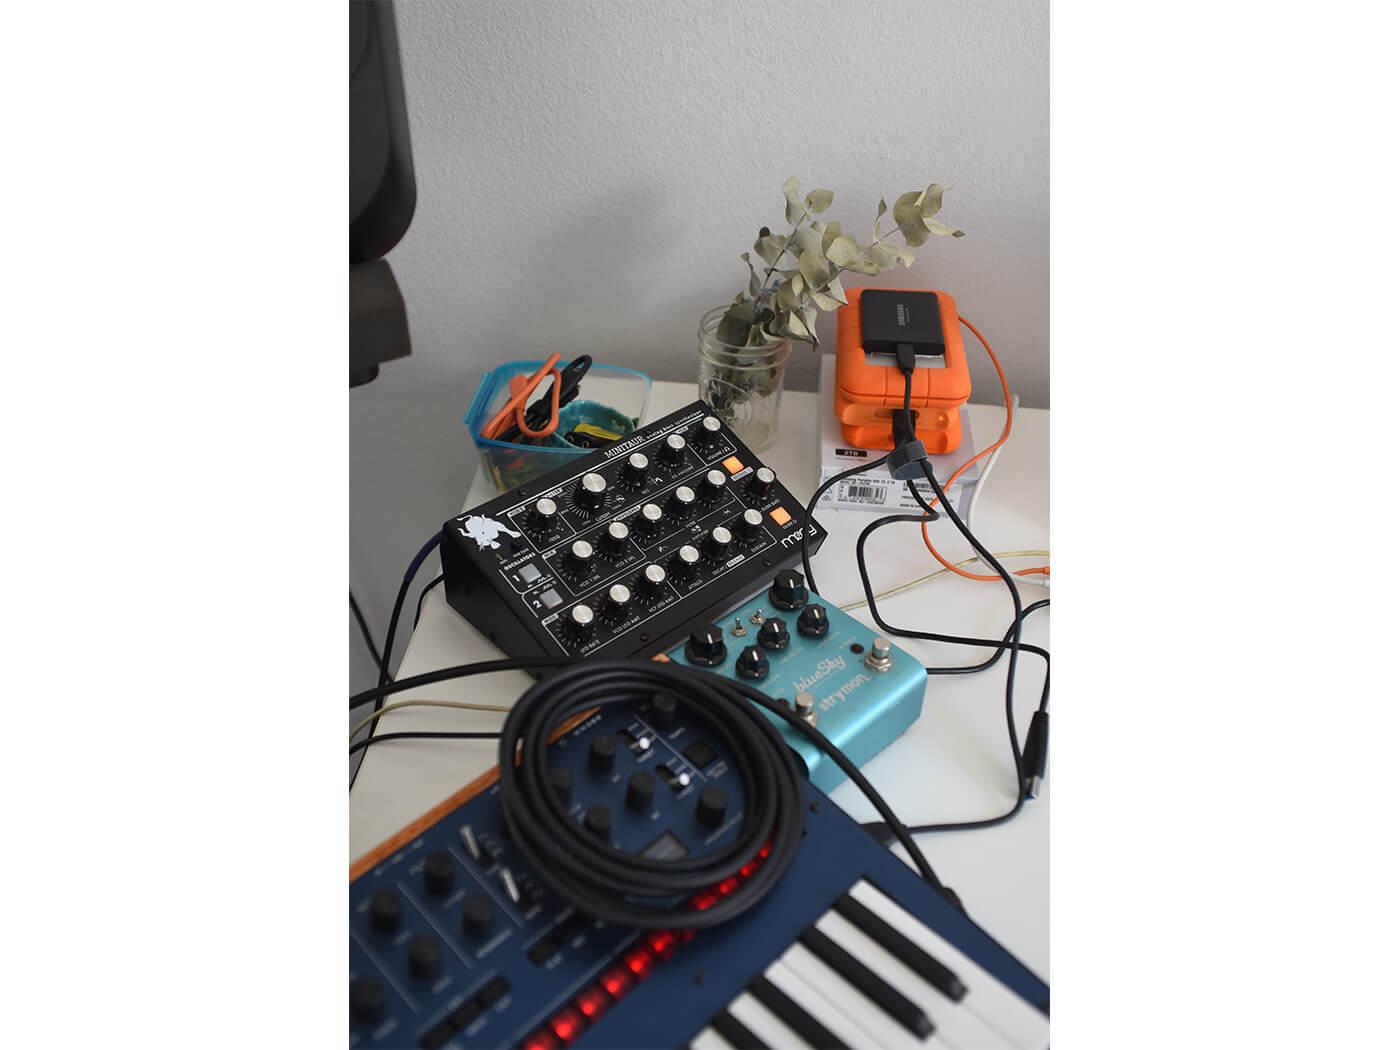 Obli Studio minotaur